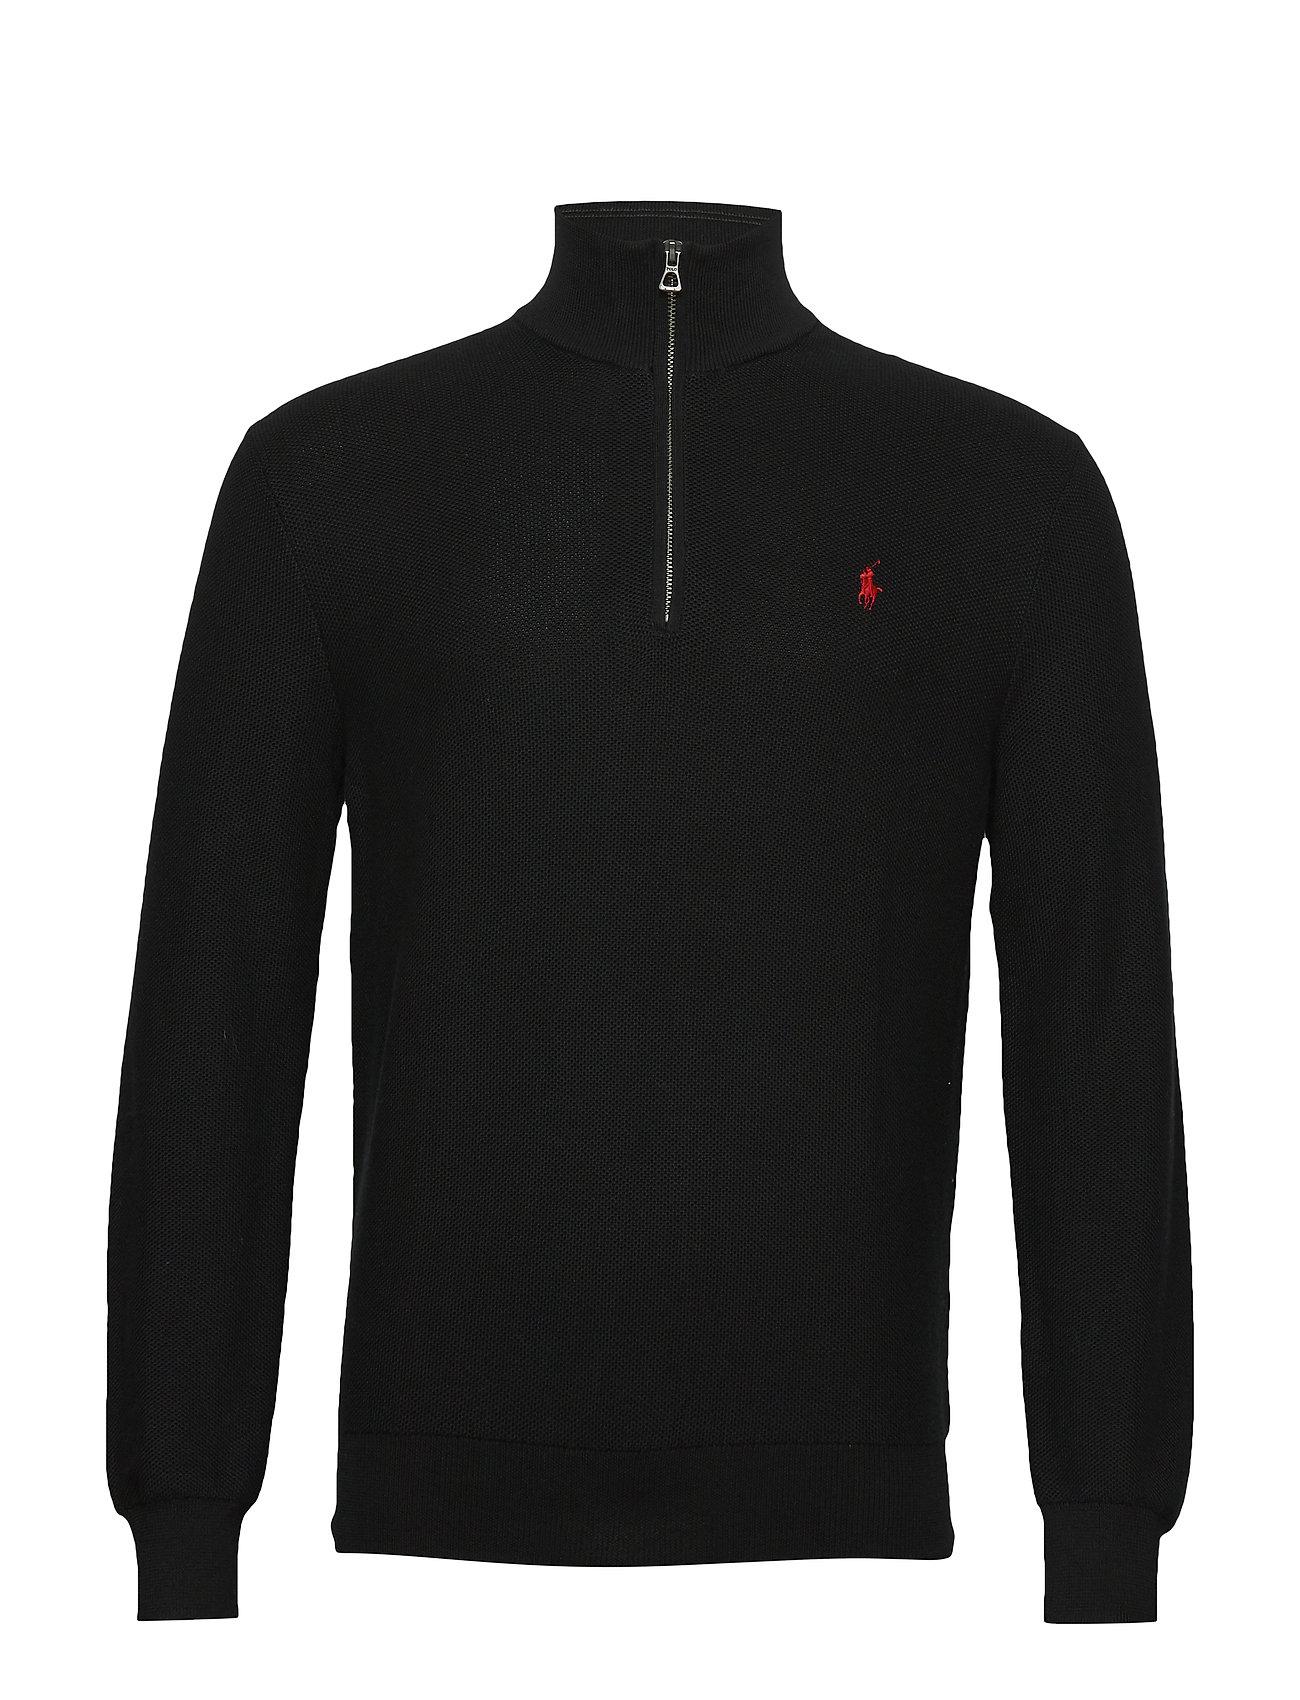 Polo Ralph Lauren Cotton Half-Zip Sweater - POLO BLACK